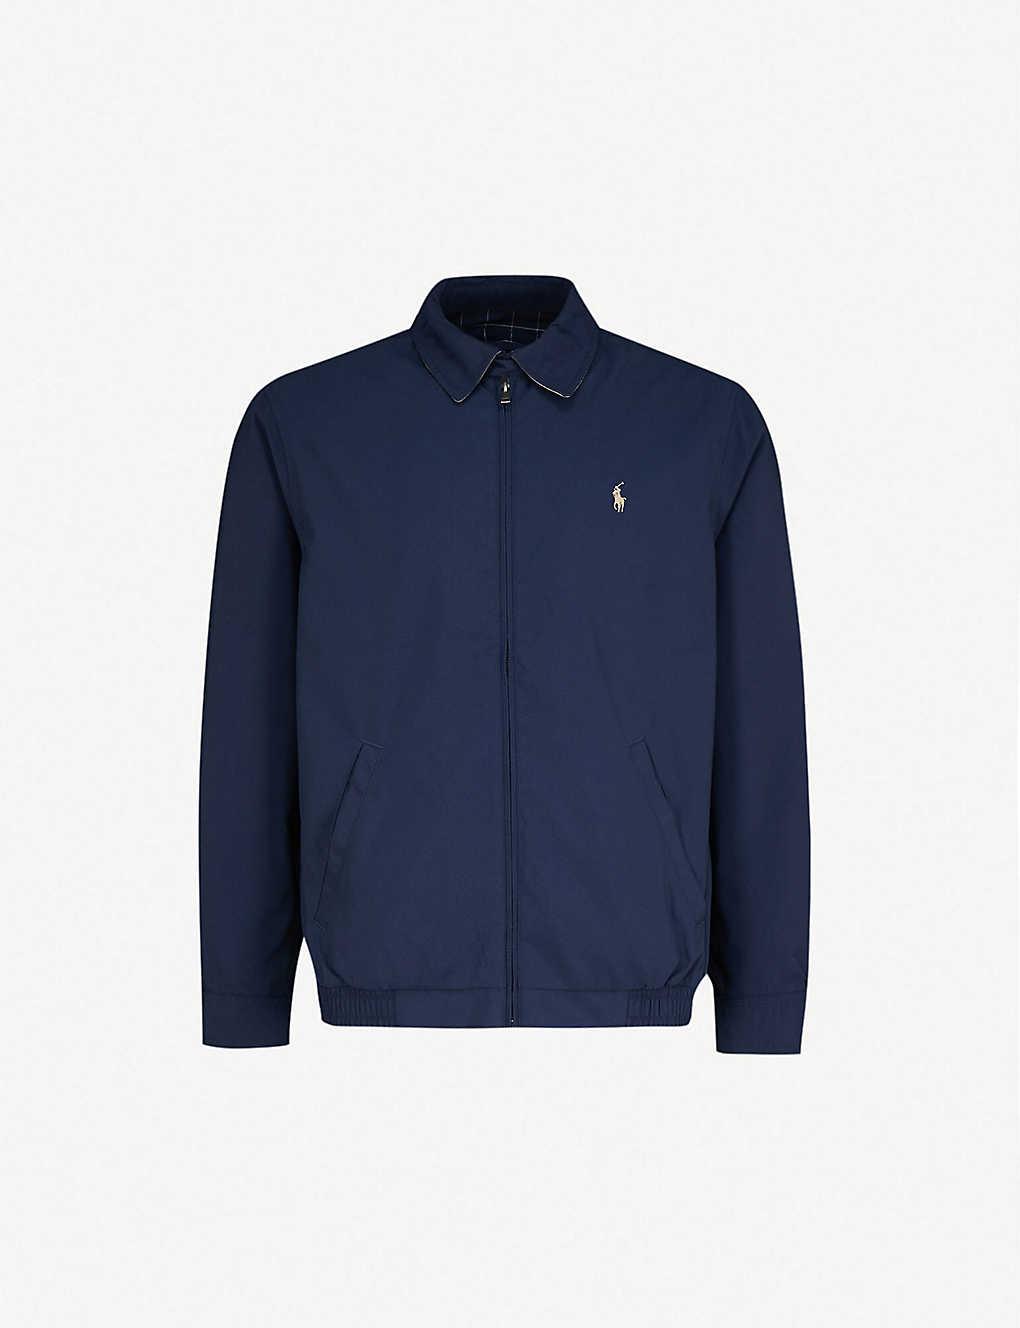 6da1b06d14a481 POLO RALPH LAUREN - New fit bi-swing windbreaker jacket | Selfridges.com